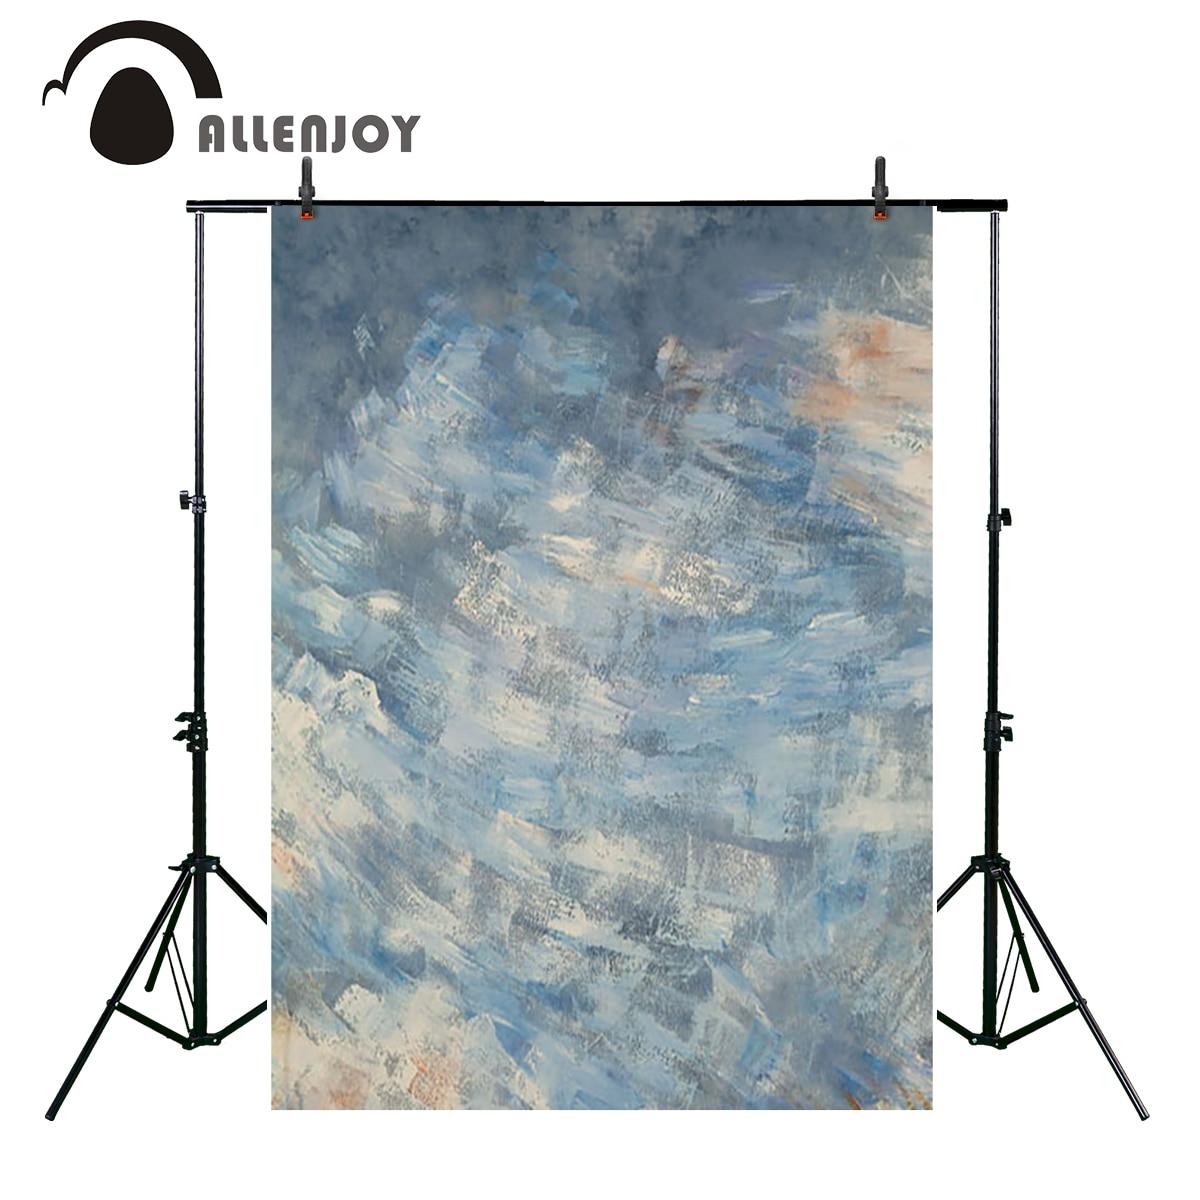 Allenjoy pastel blue blended texture photography backgrounds abstract Computer Print portrait baby shower backdrop photo studio howard aiken – portrait of a computer pioneer